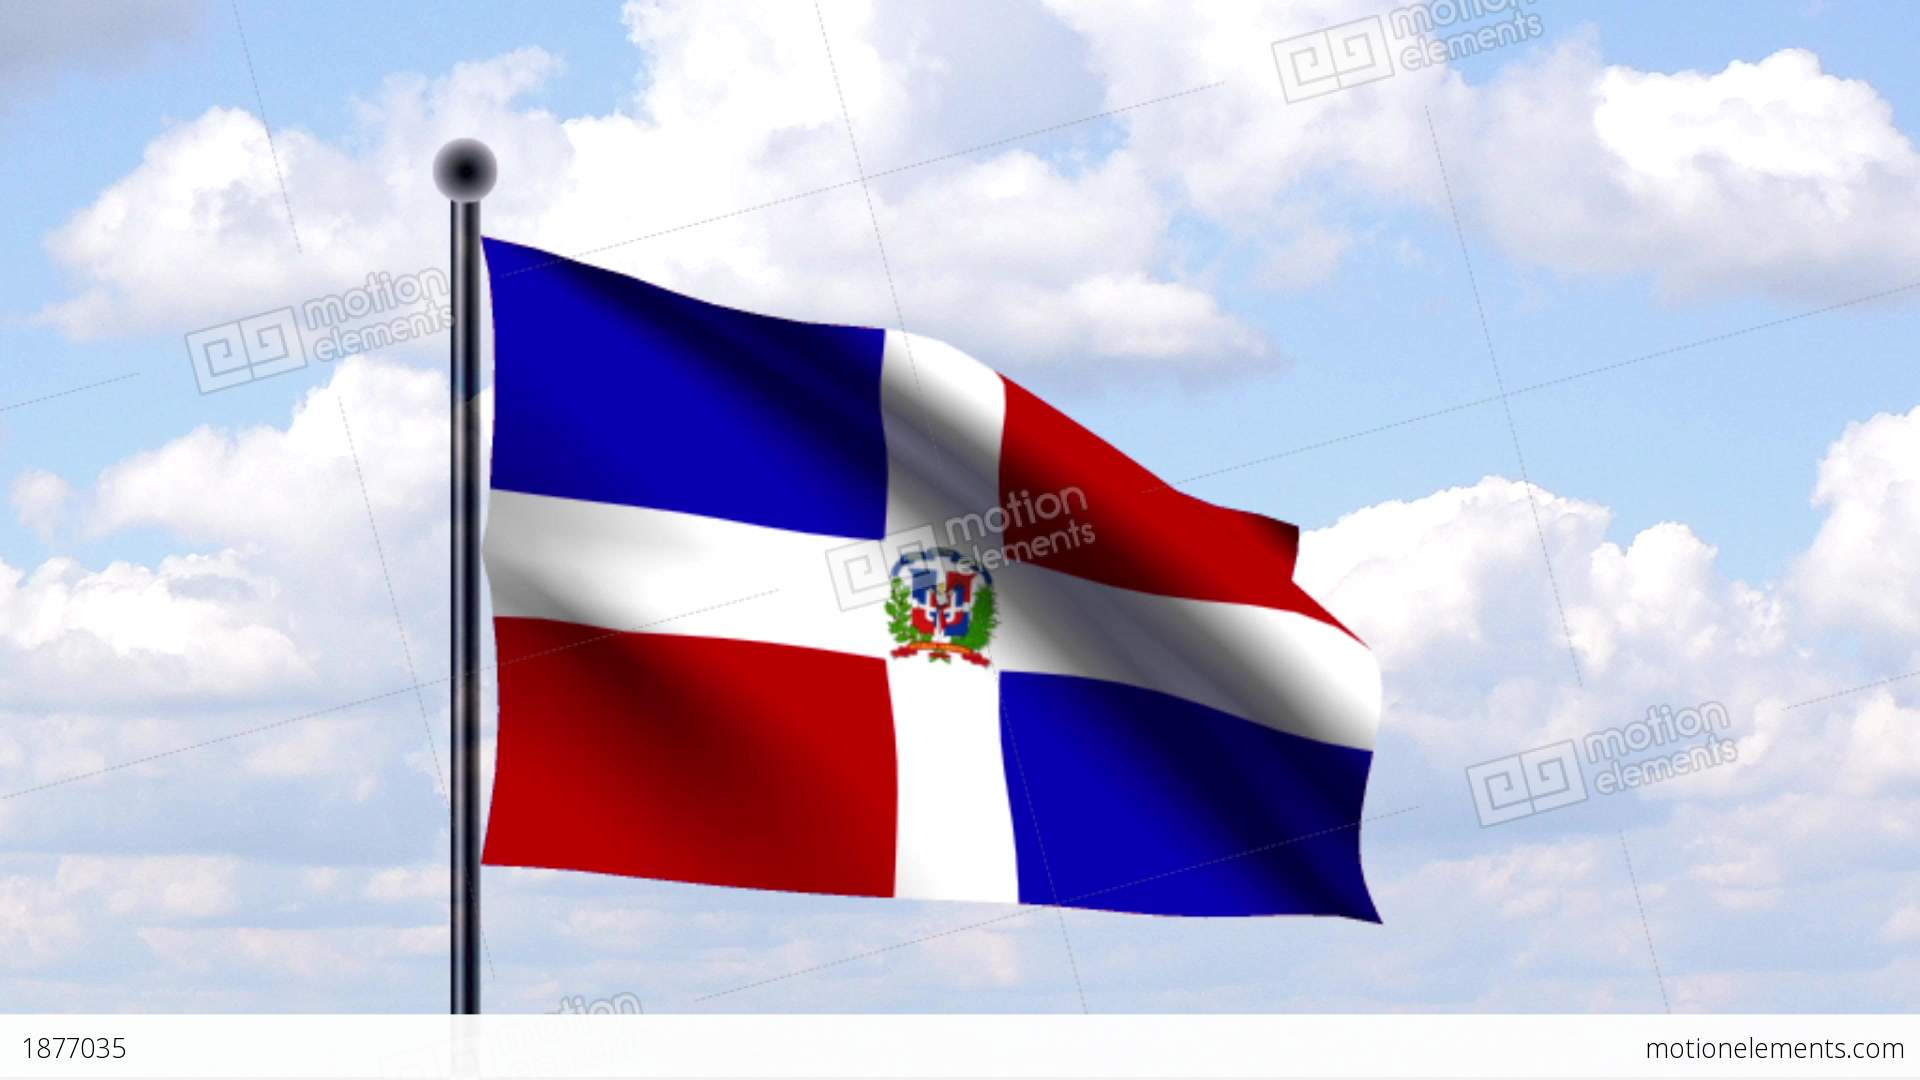 Something dominican republic flag bikini matchless answer